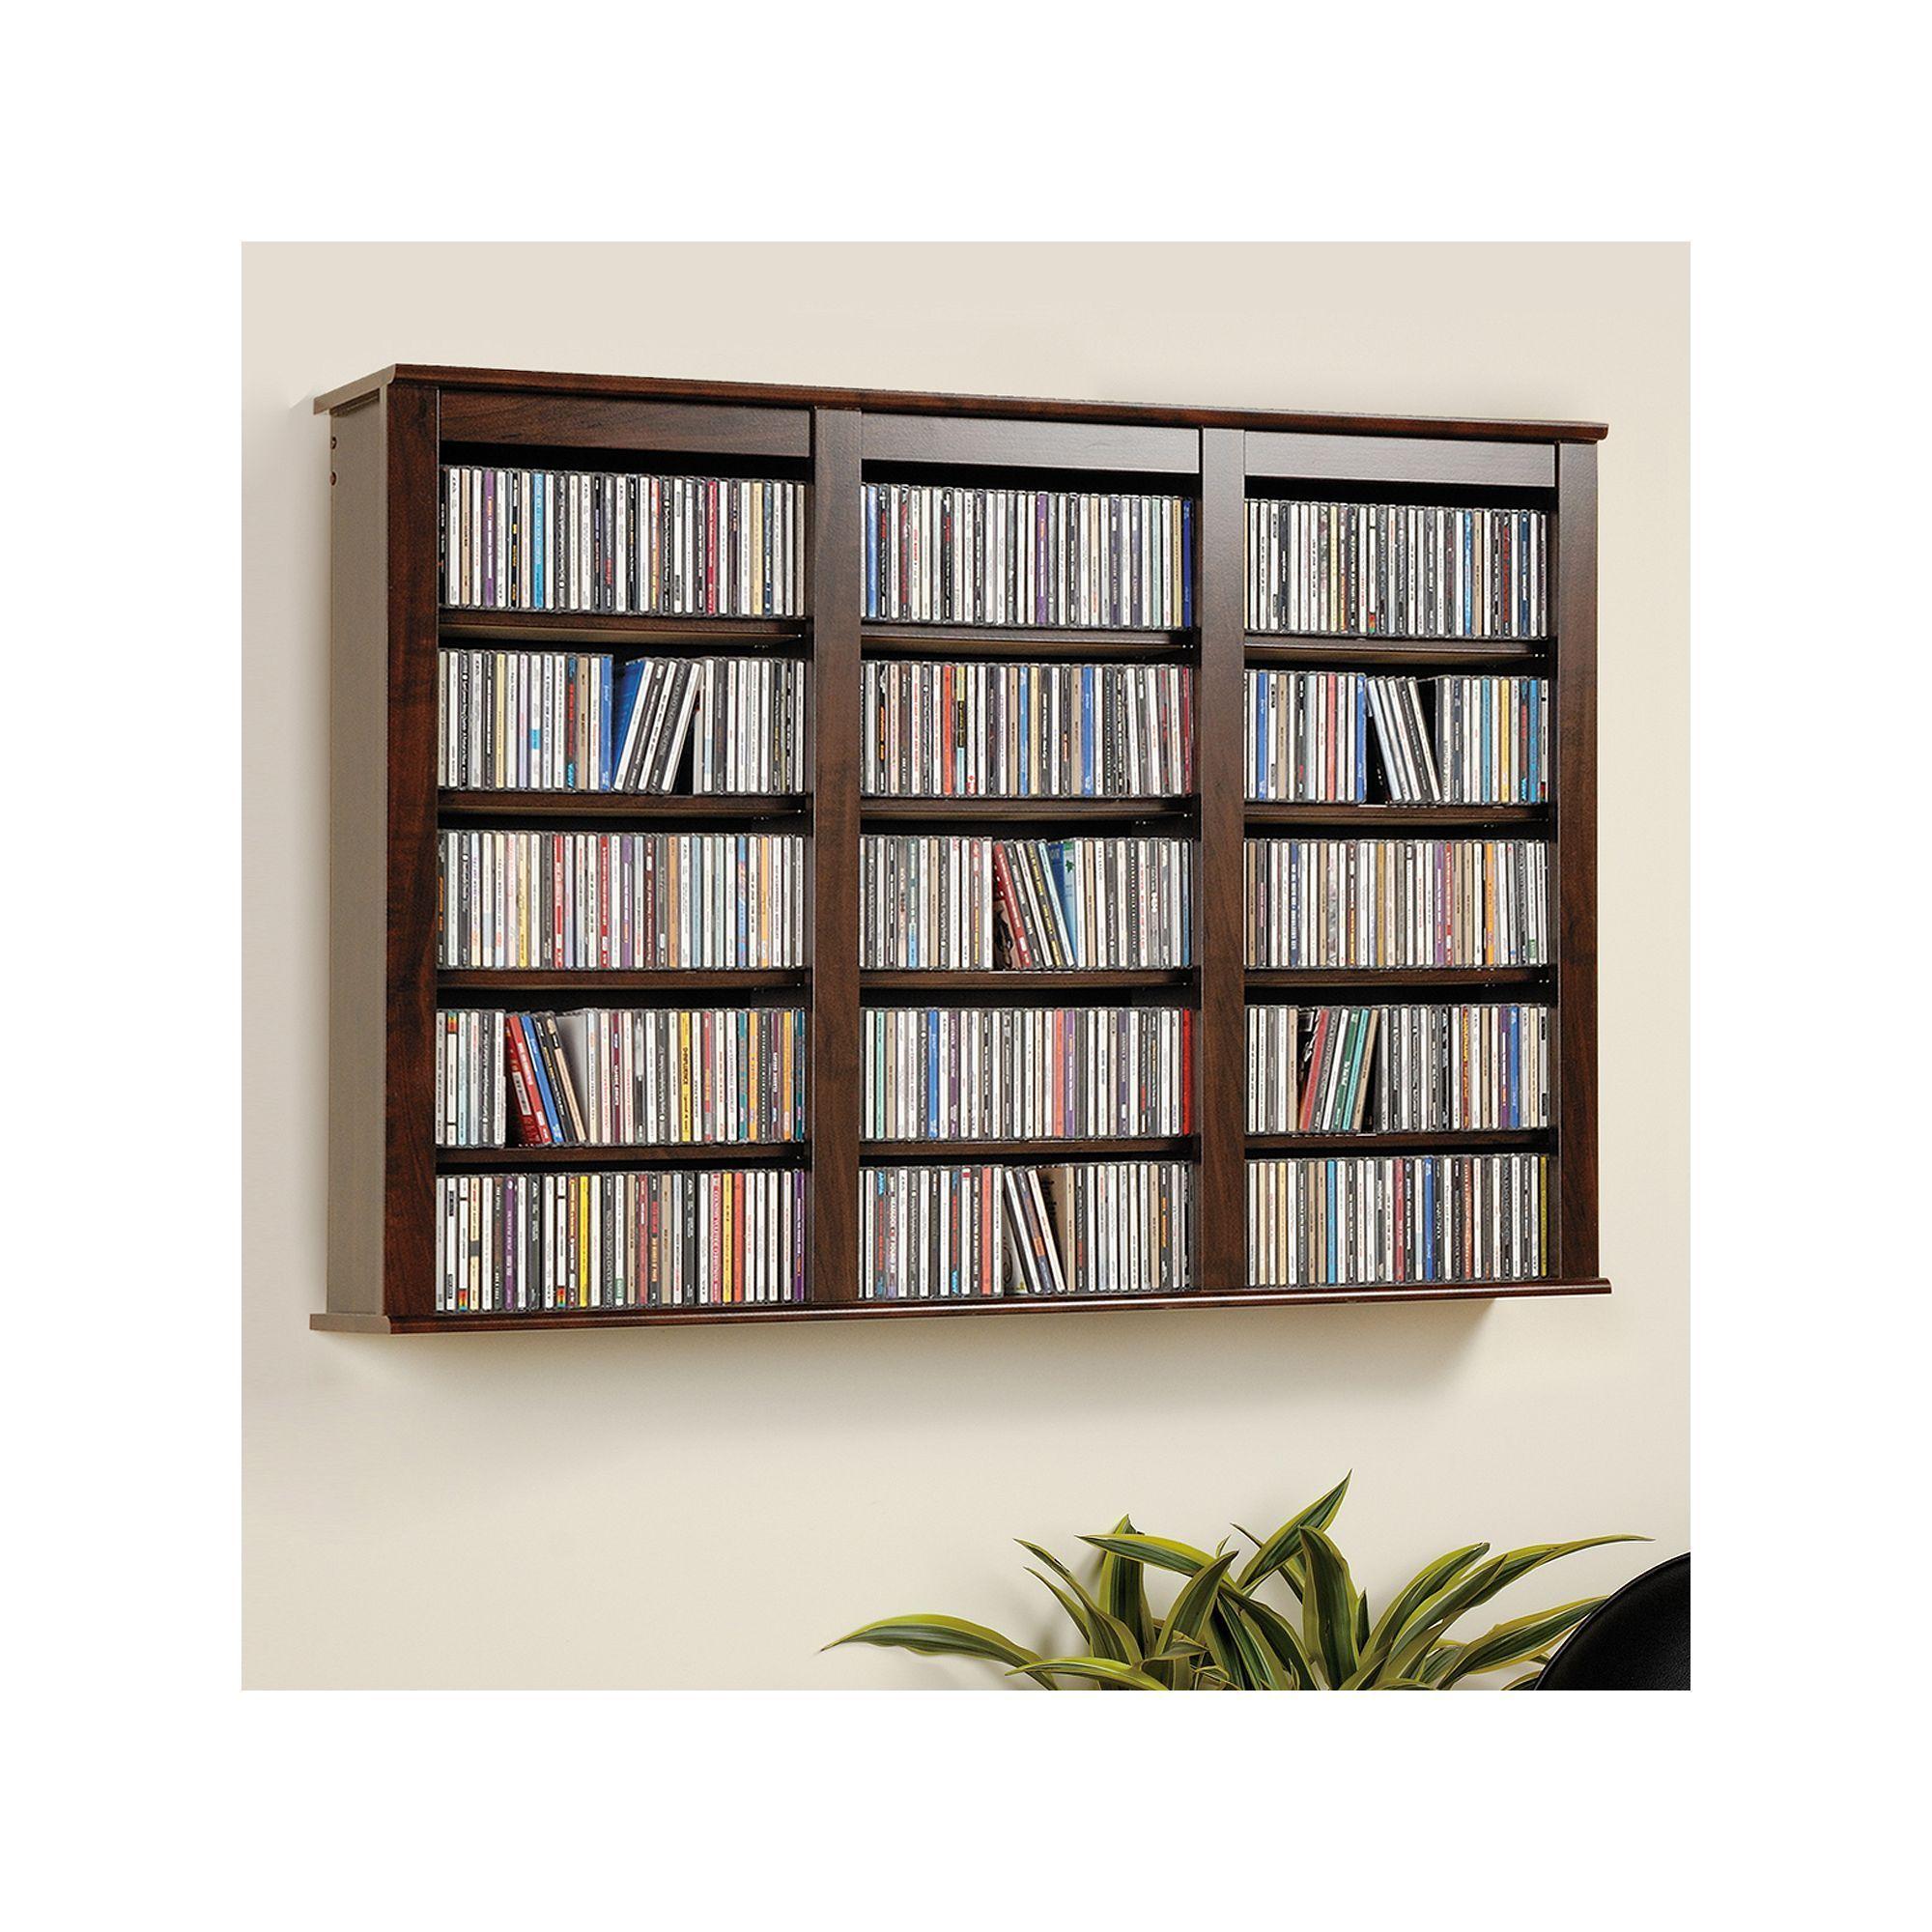 Prepac Wall Mounted Multimedia Storage In 2020 Wall Mounted Storage Shelves Wall Mounted Shelves Media Storage Cabinet